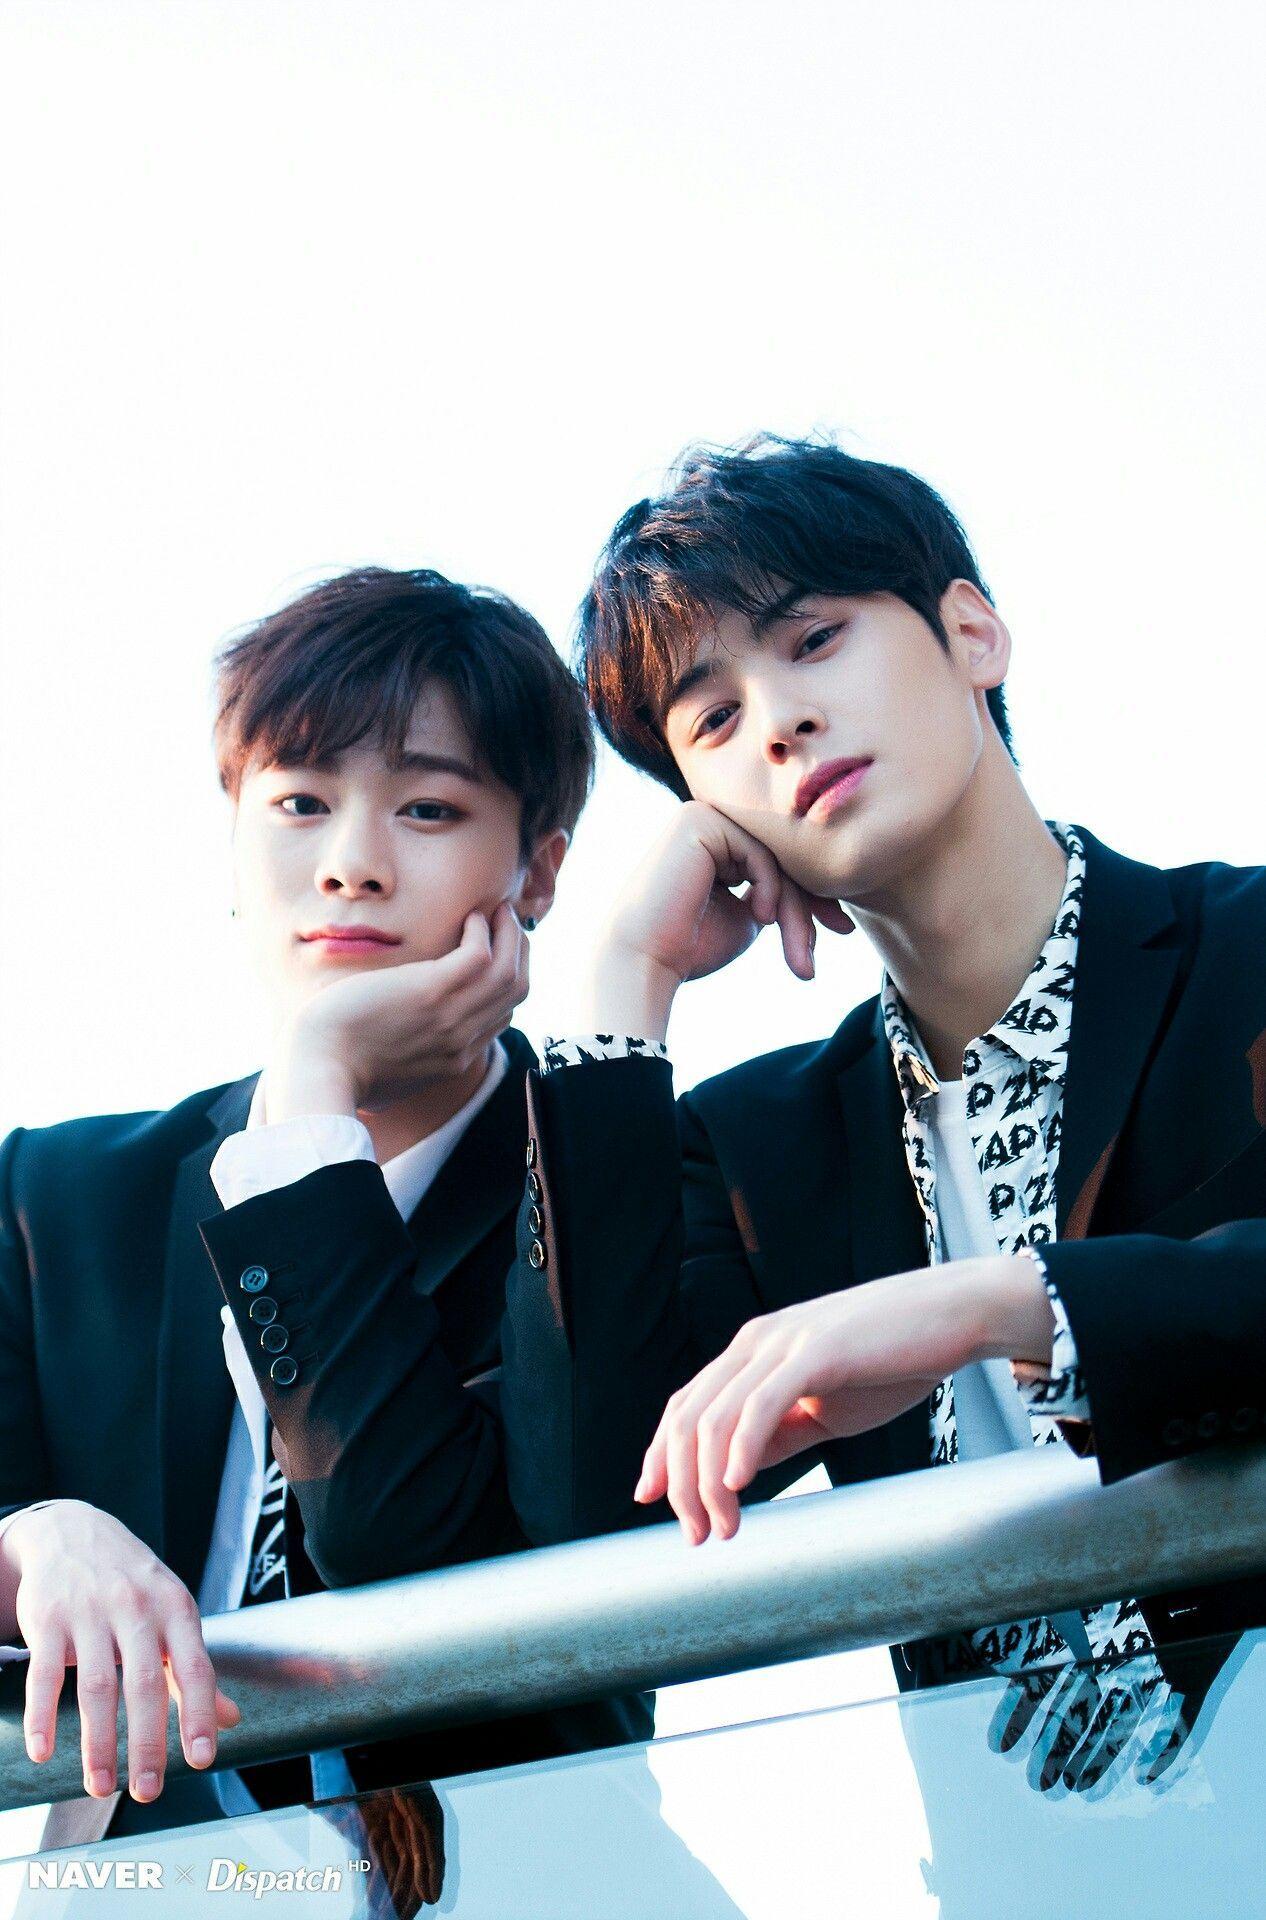 Astro Members Quiz Astro Profile Astroprofile Members They Are Jinjin Mj Cha Eunwoo Moonbin Rocky And Idols Coreanos Cha Eun Woo Cantantes Coreanos